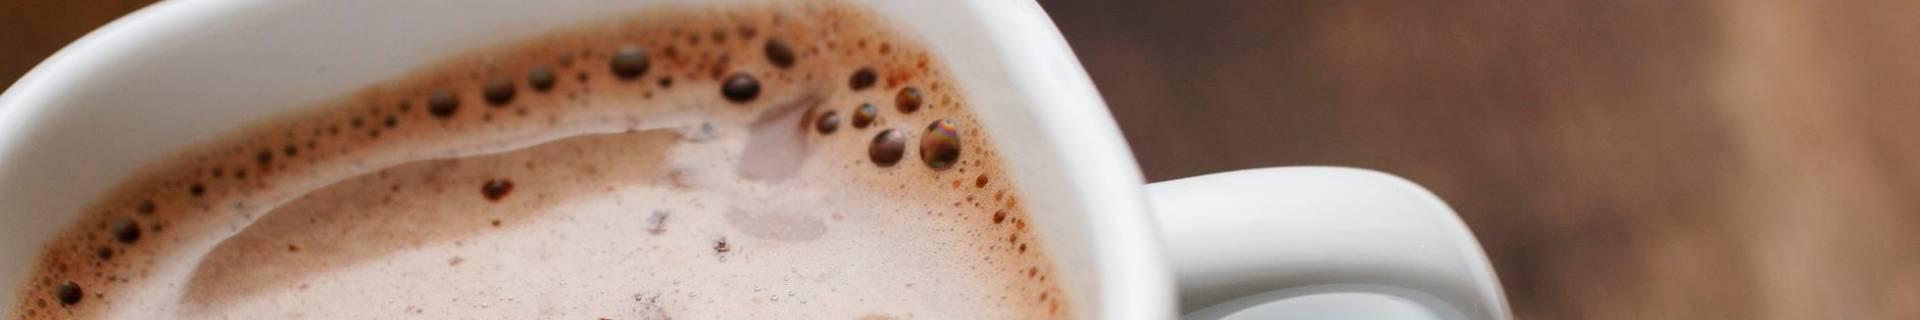 Cafè instantani ecològic - ECOLECTIA